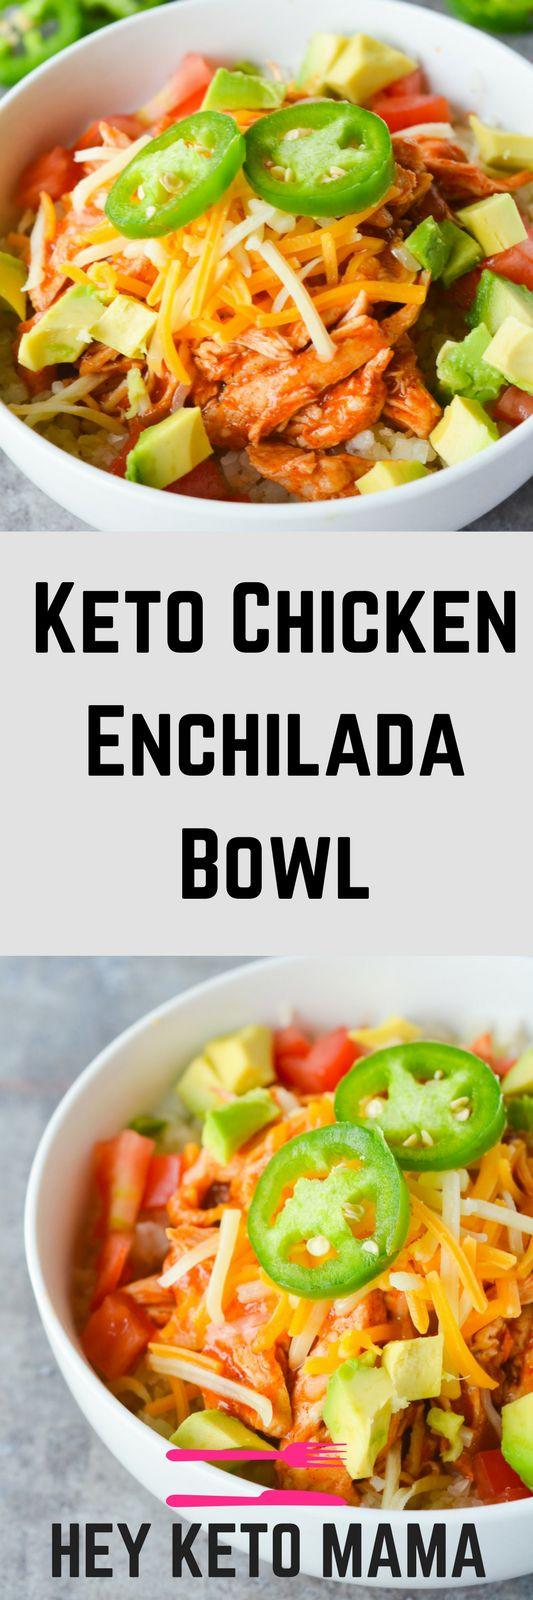 Keto Recipes For Dinner  Keto Chicken Enchilada Bowl Recipe keto